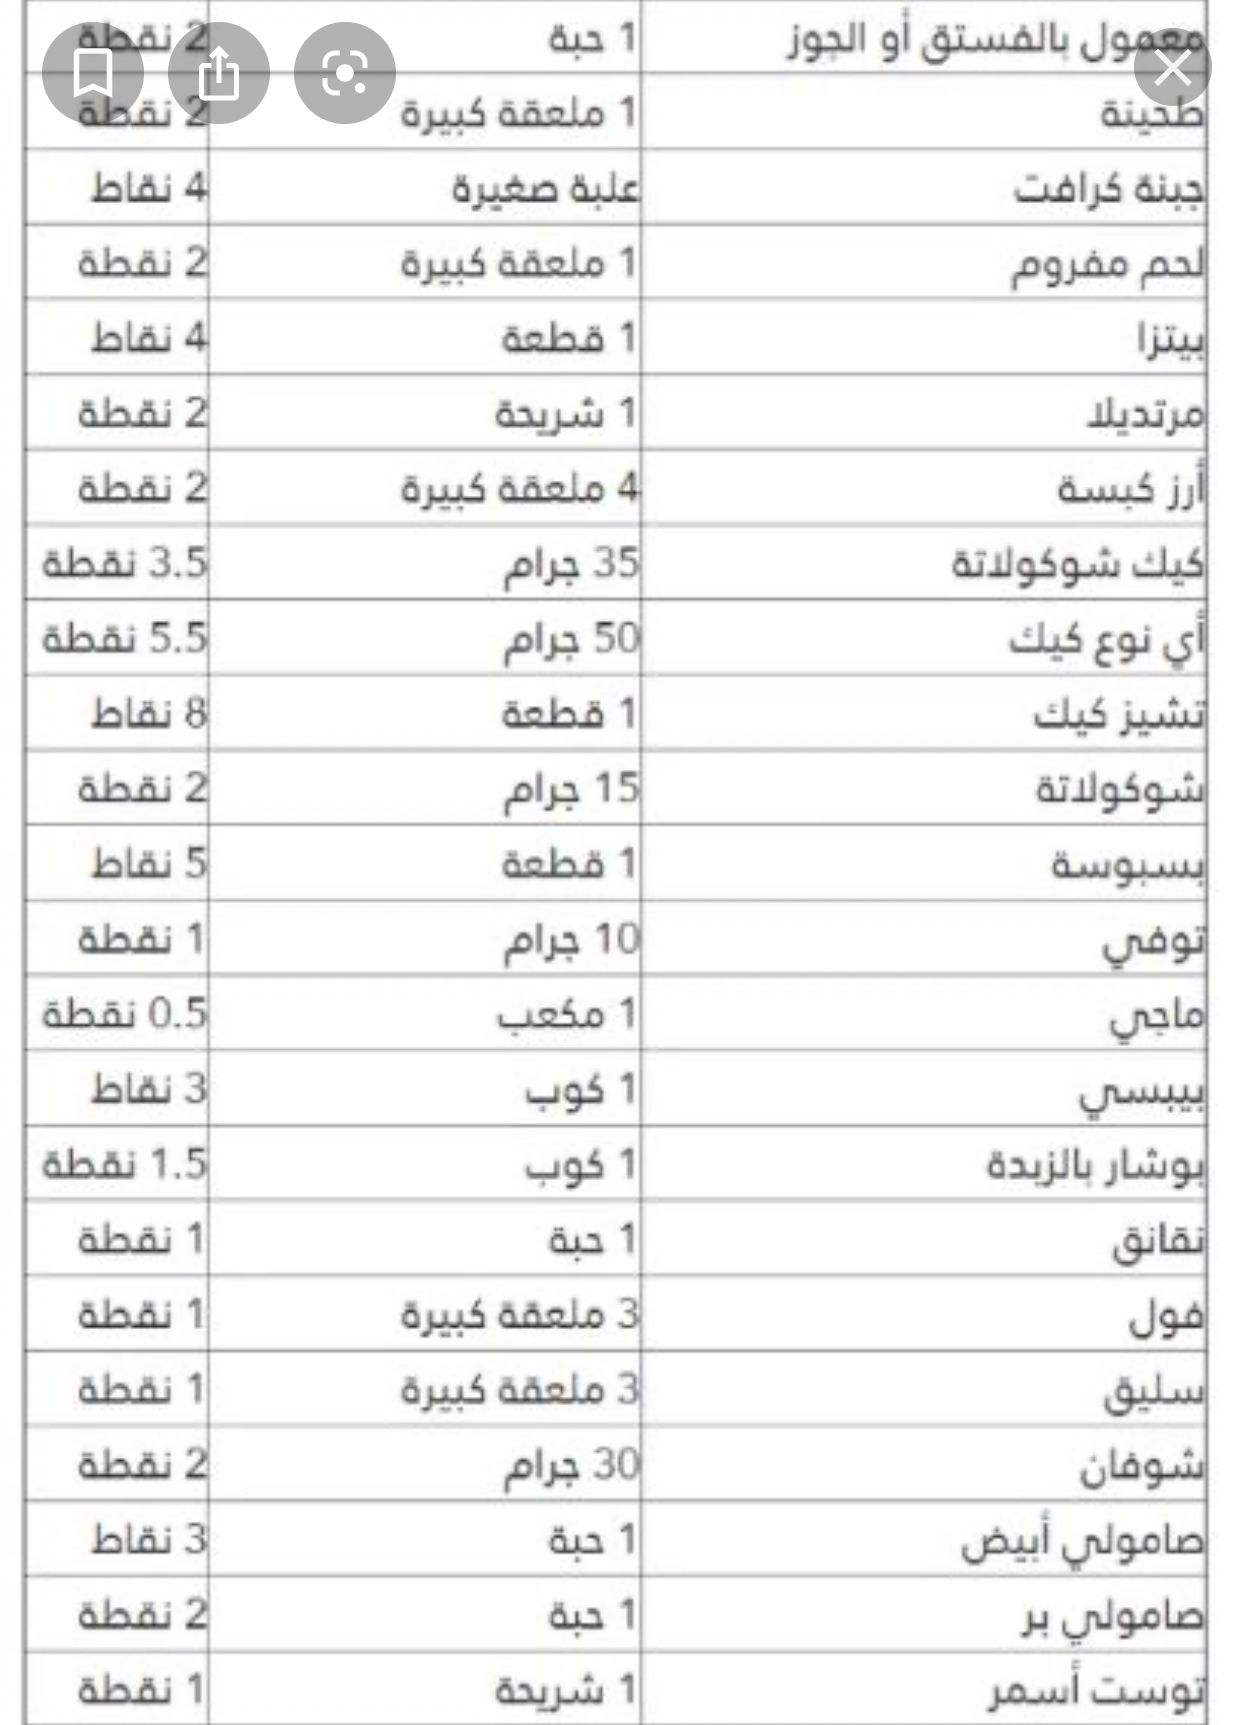 Pin By Amal Saeed On رجيم النقاط والكيتو Healthy Recipes Health Diet